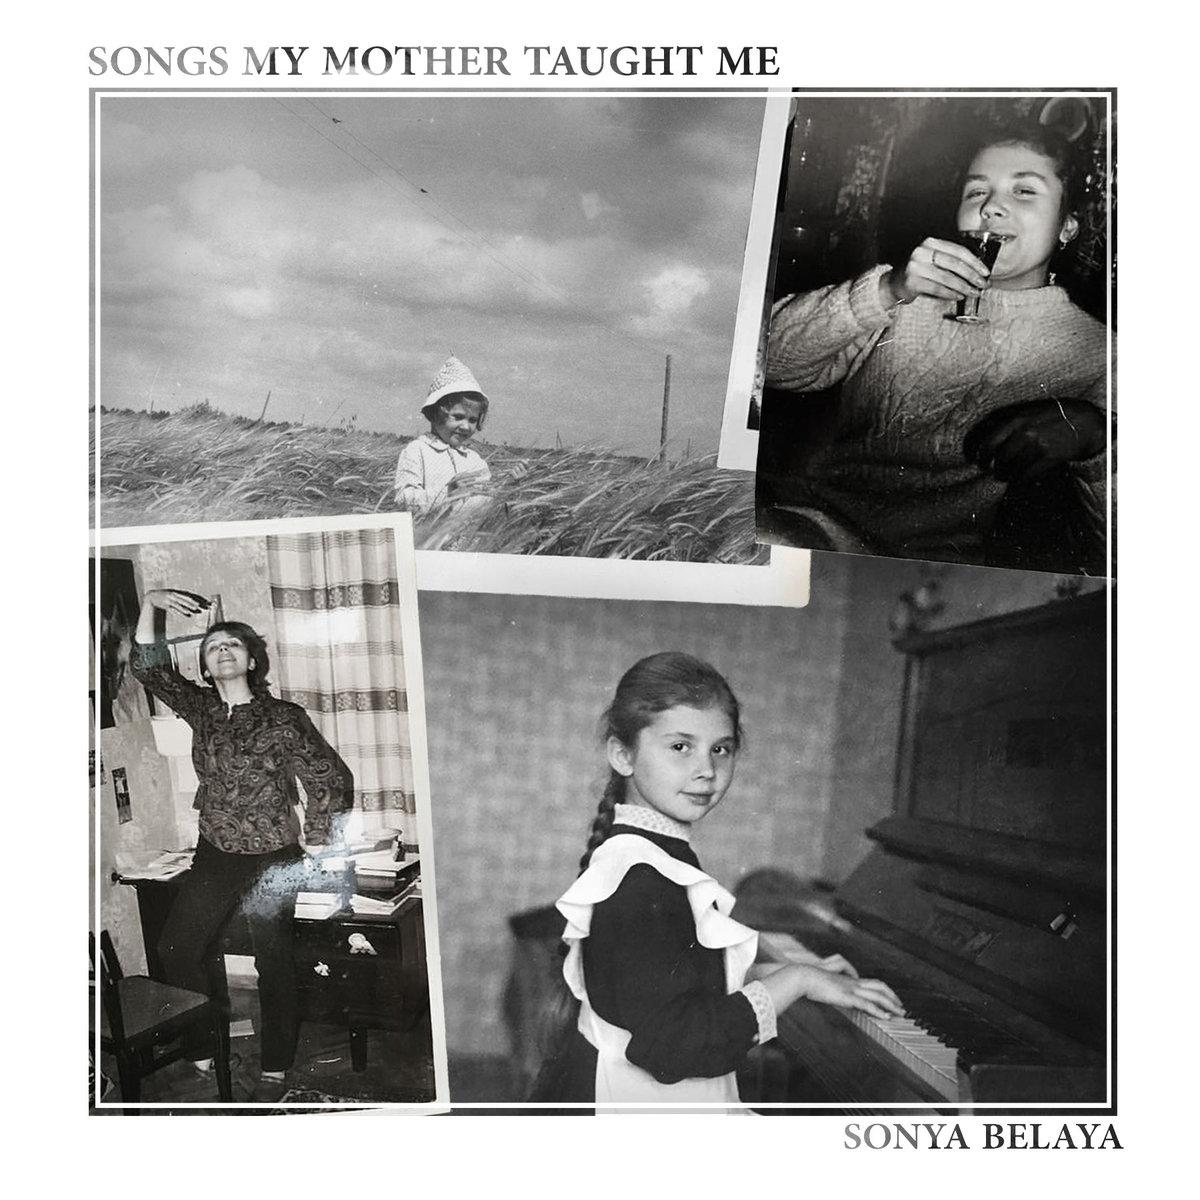 Songs My Mother Taught Me by Sonya Belaya